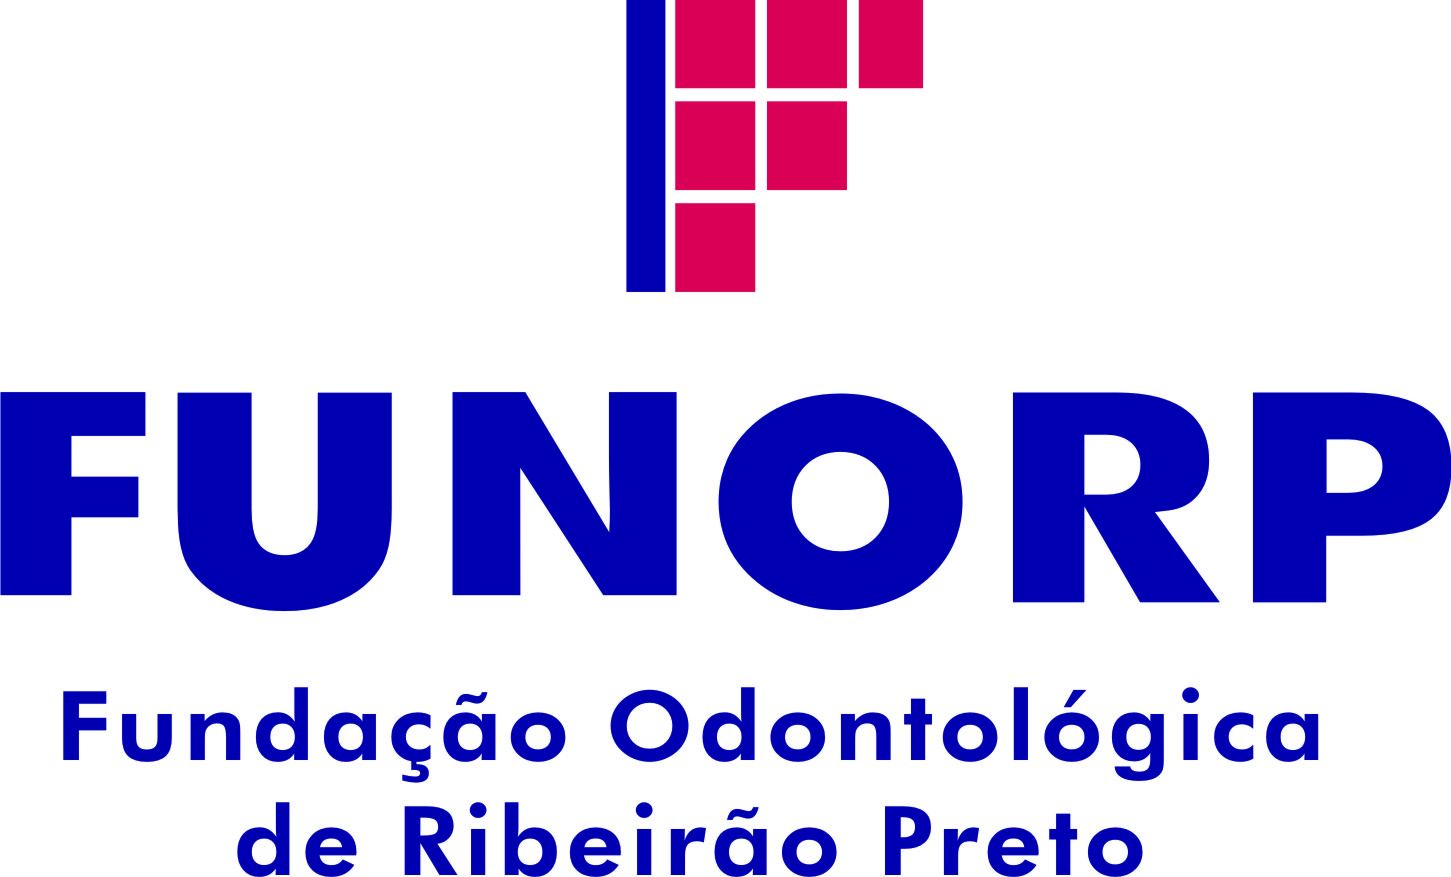 HANDS ON: PREPARO DENTAL PARA ODONTOLOGIA DIGITAL